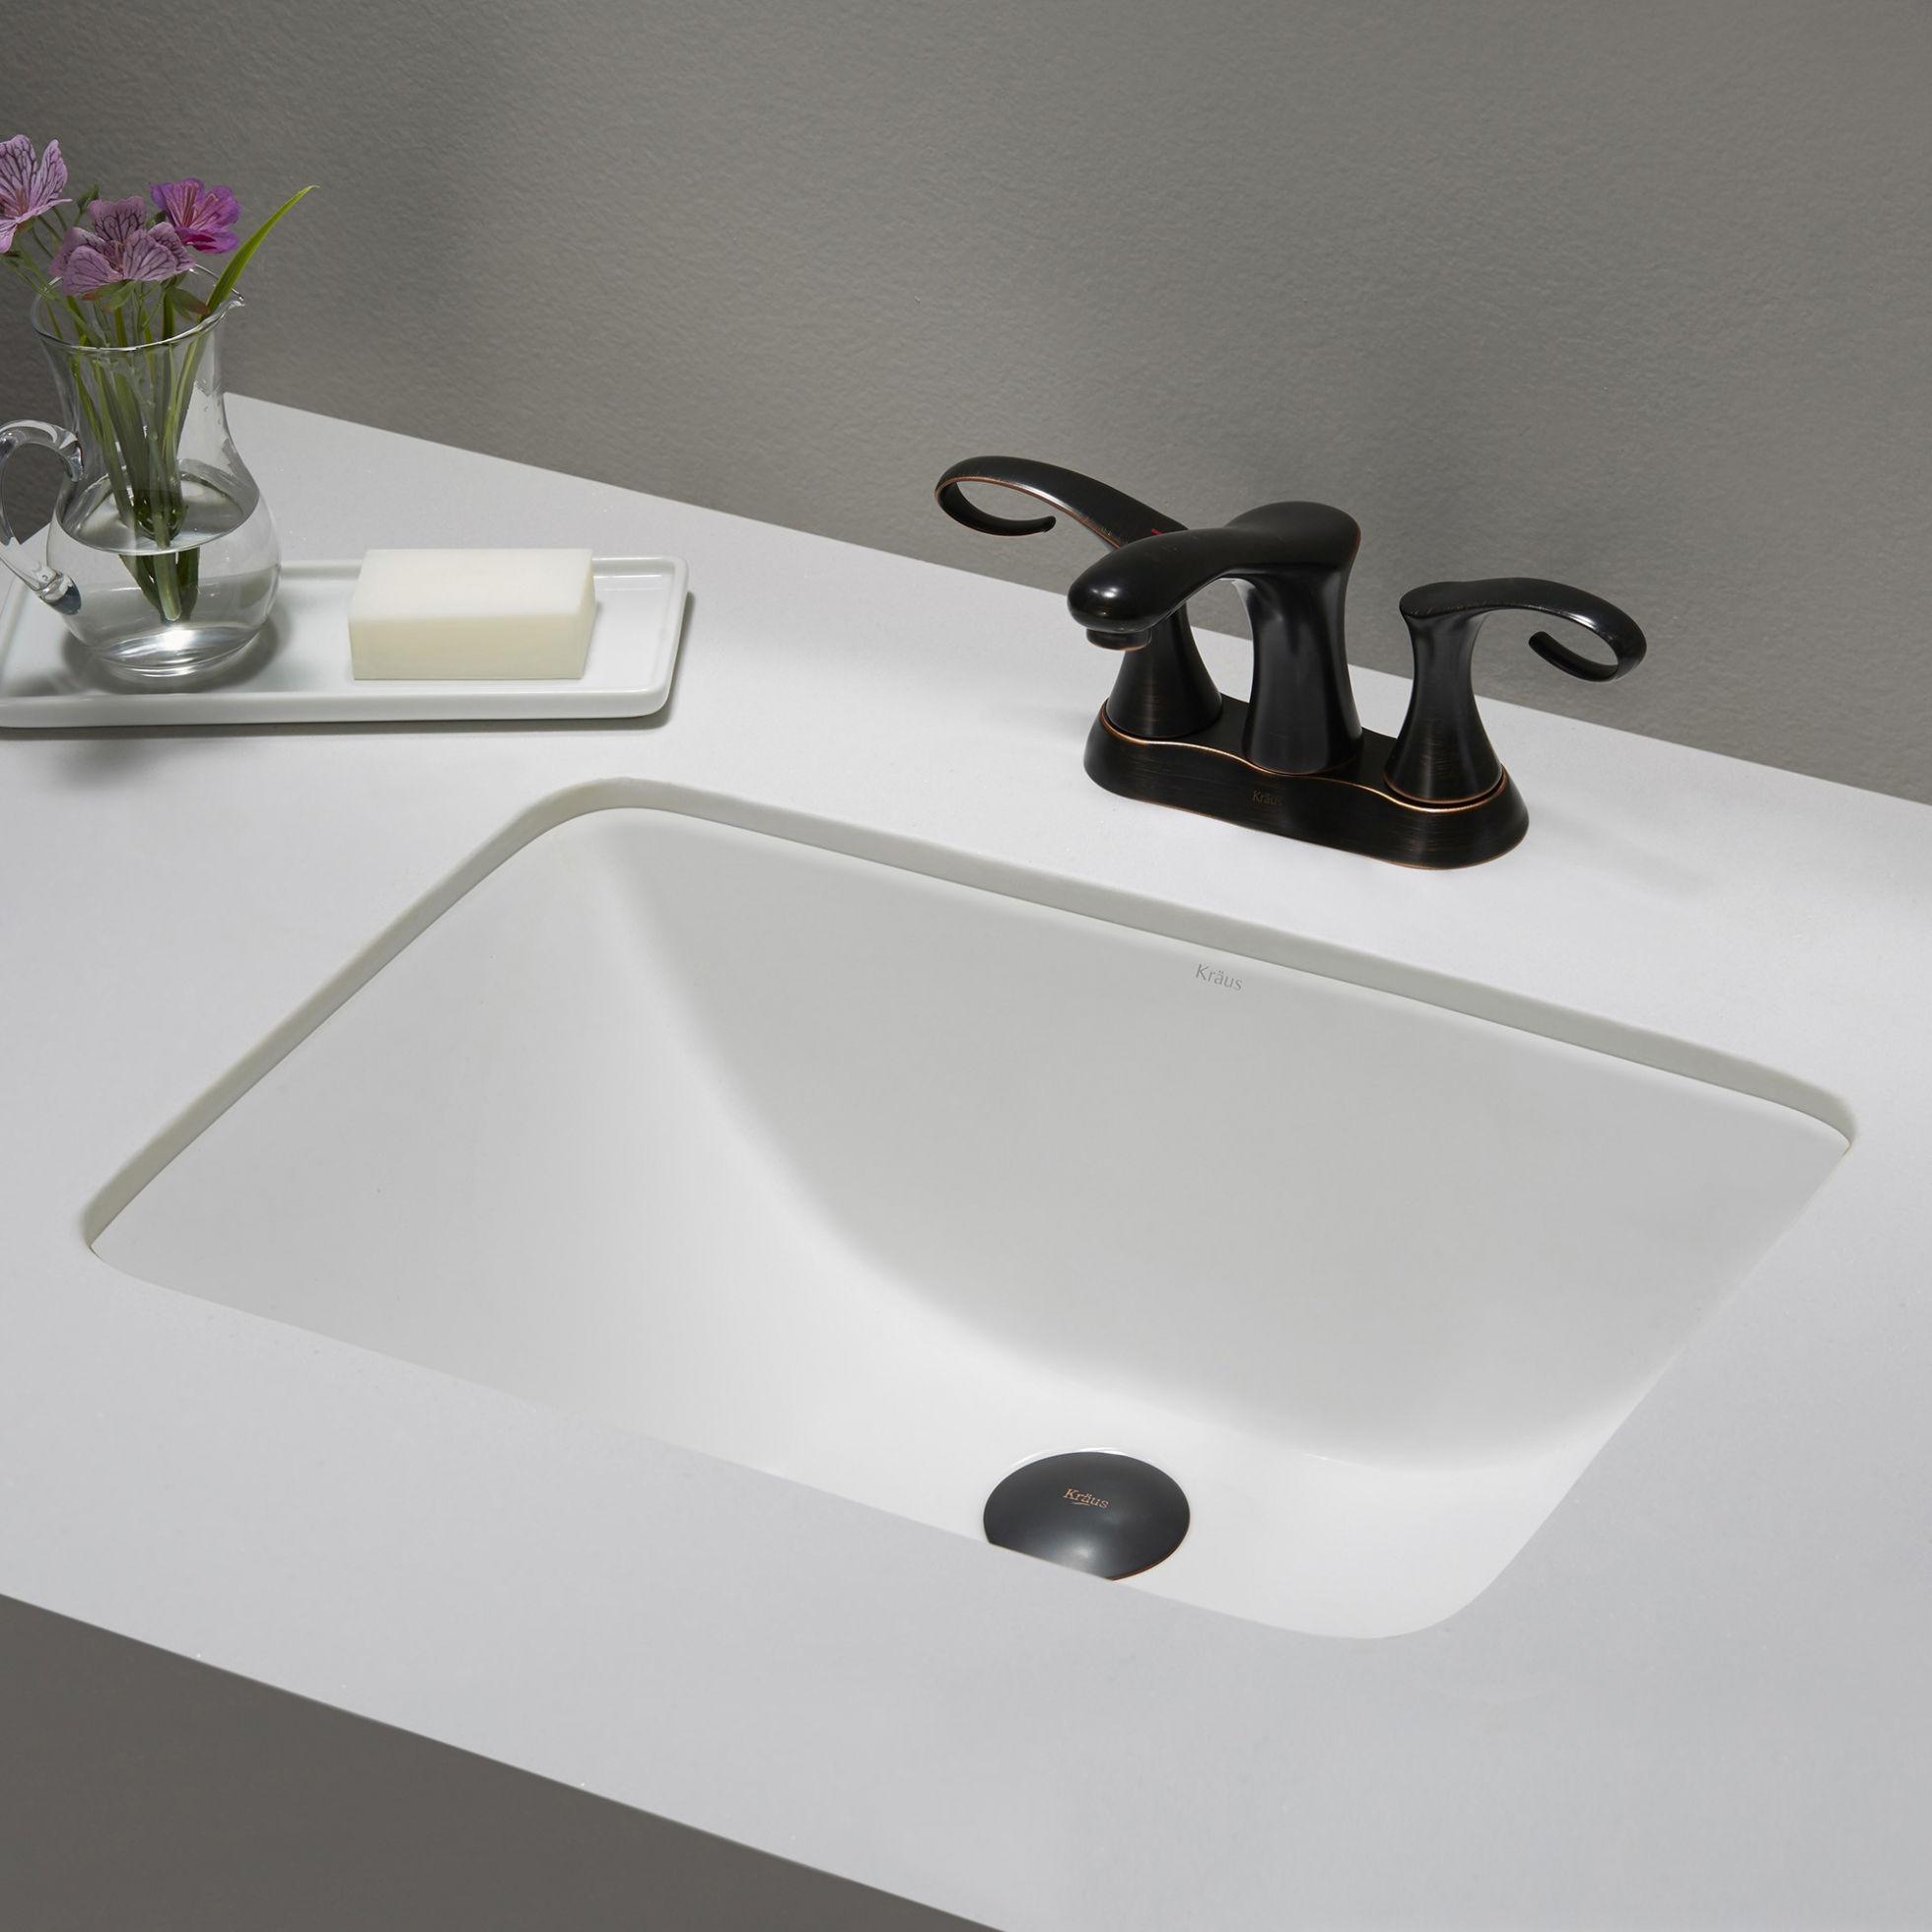 fancy american standard undermount bathroom sinks decoration-Superb American Standard Undermount Bathroom Sinks Inspiration